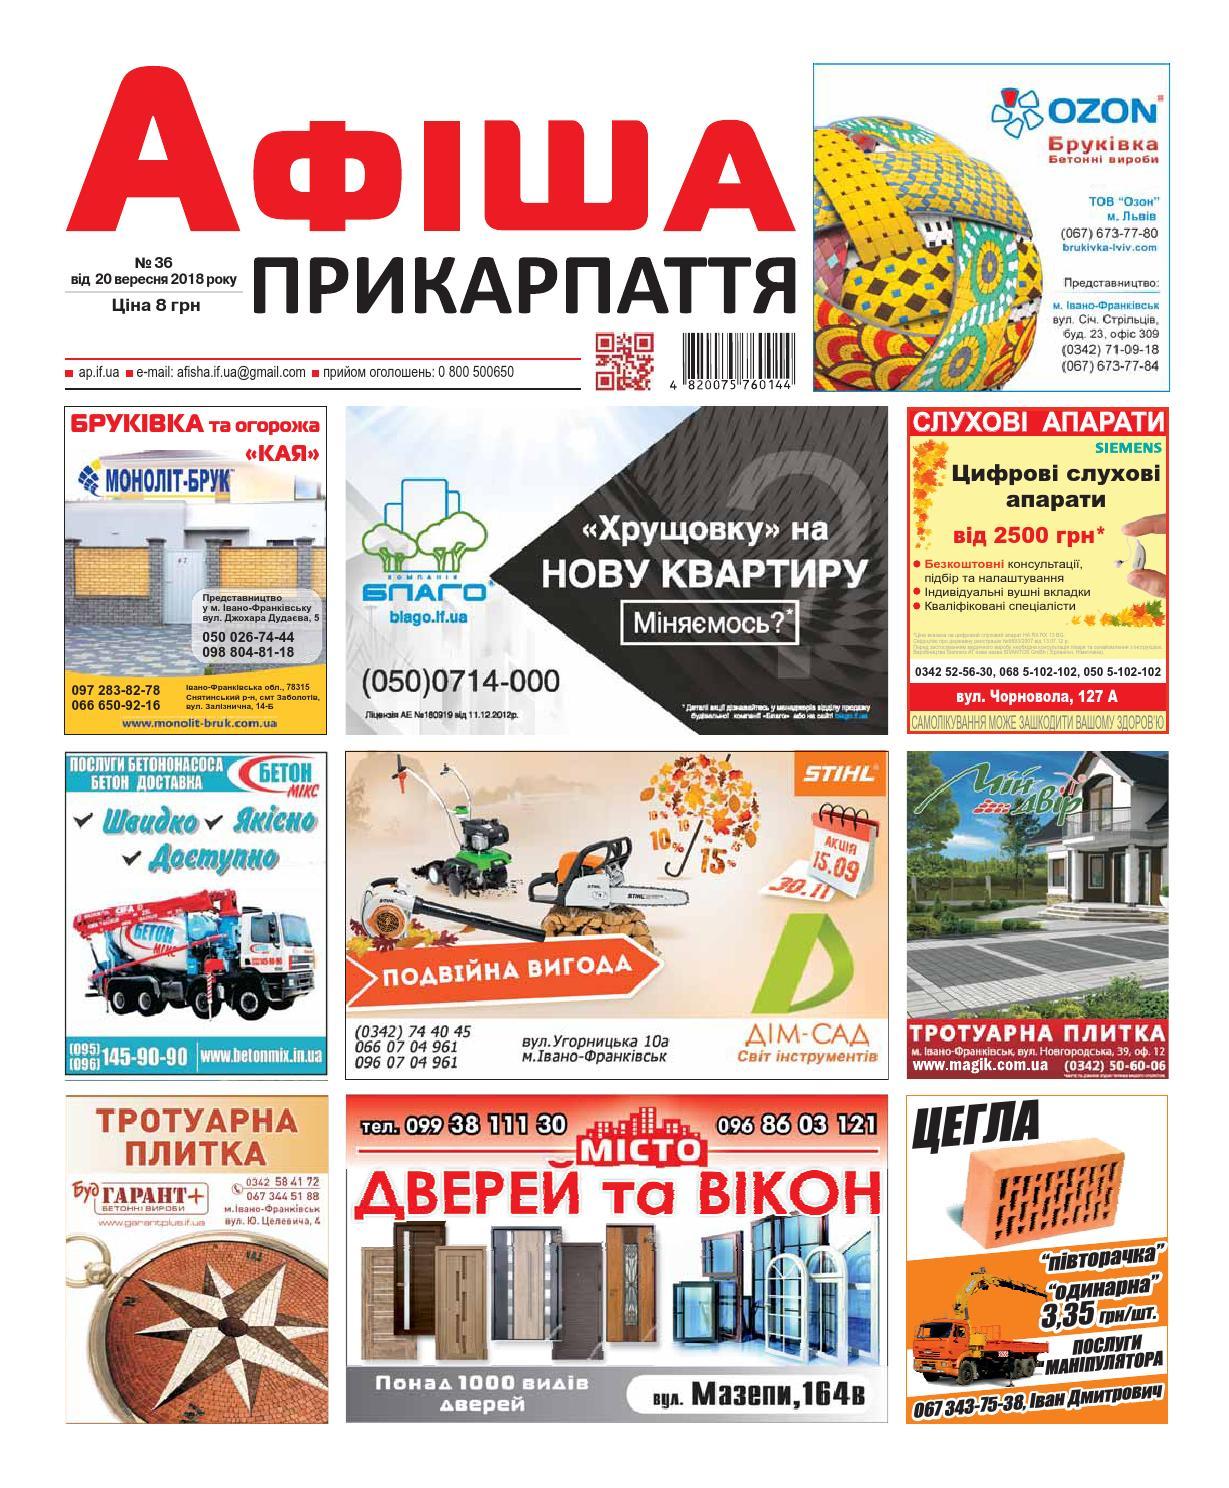 Афіша Прикарпаття №36 by Olya Olya - issuu f95701f480c09